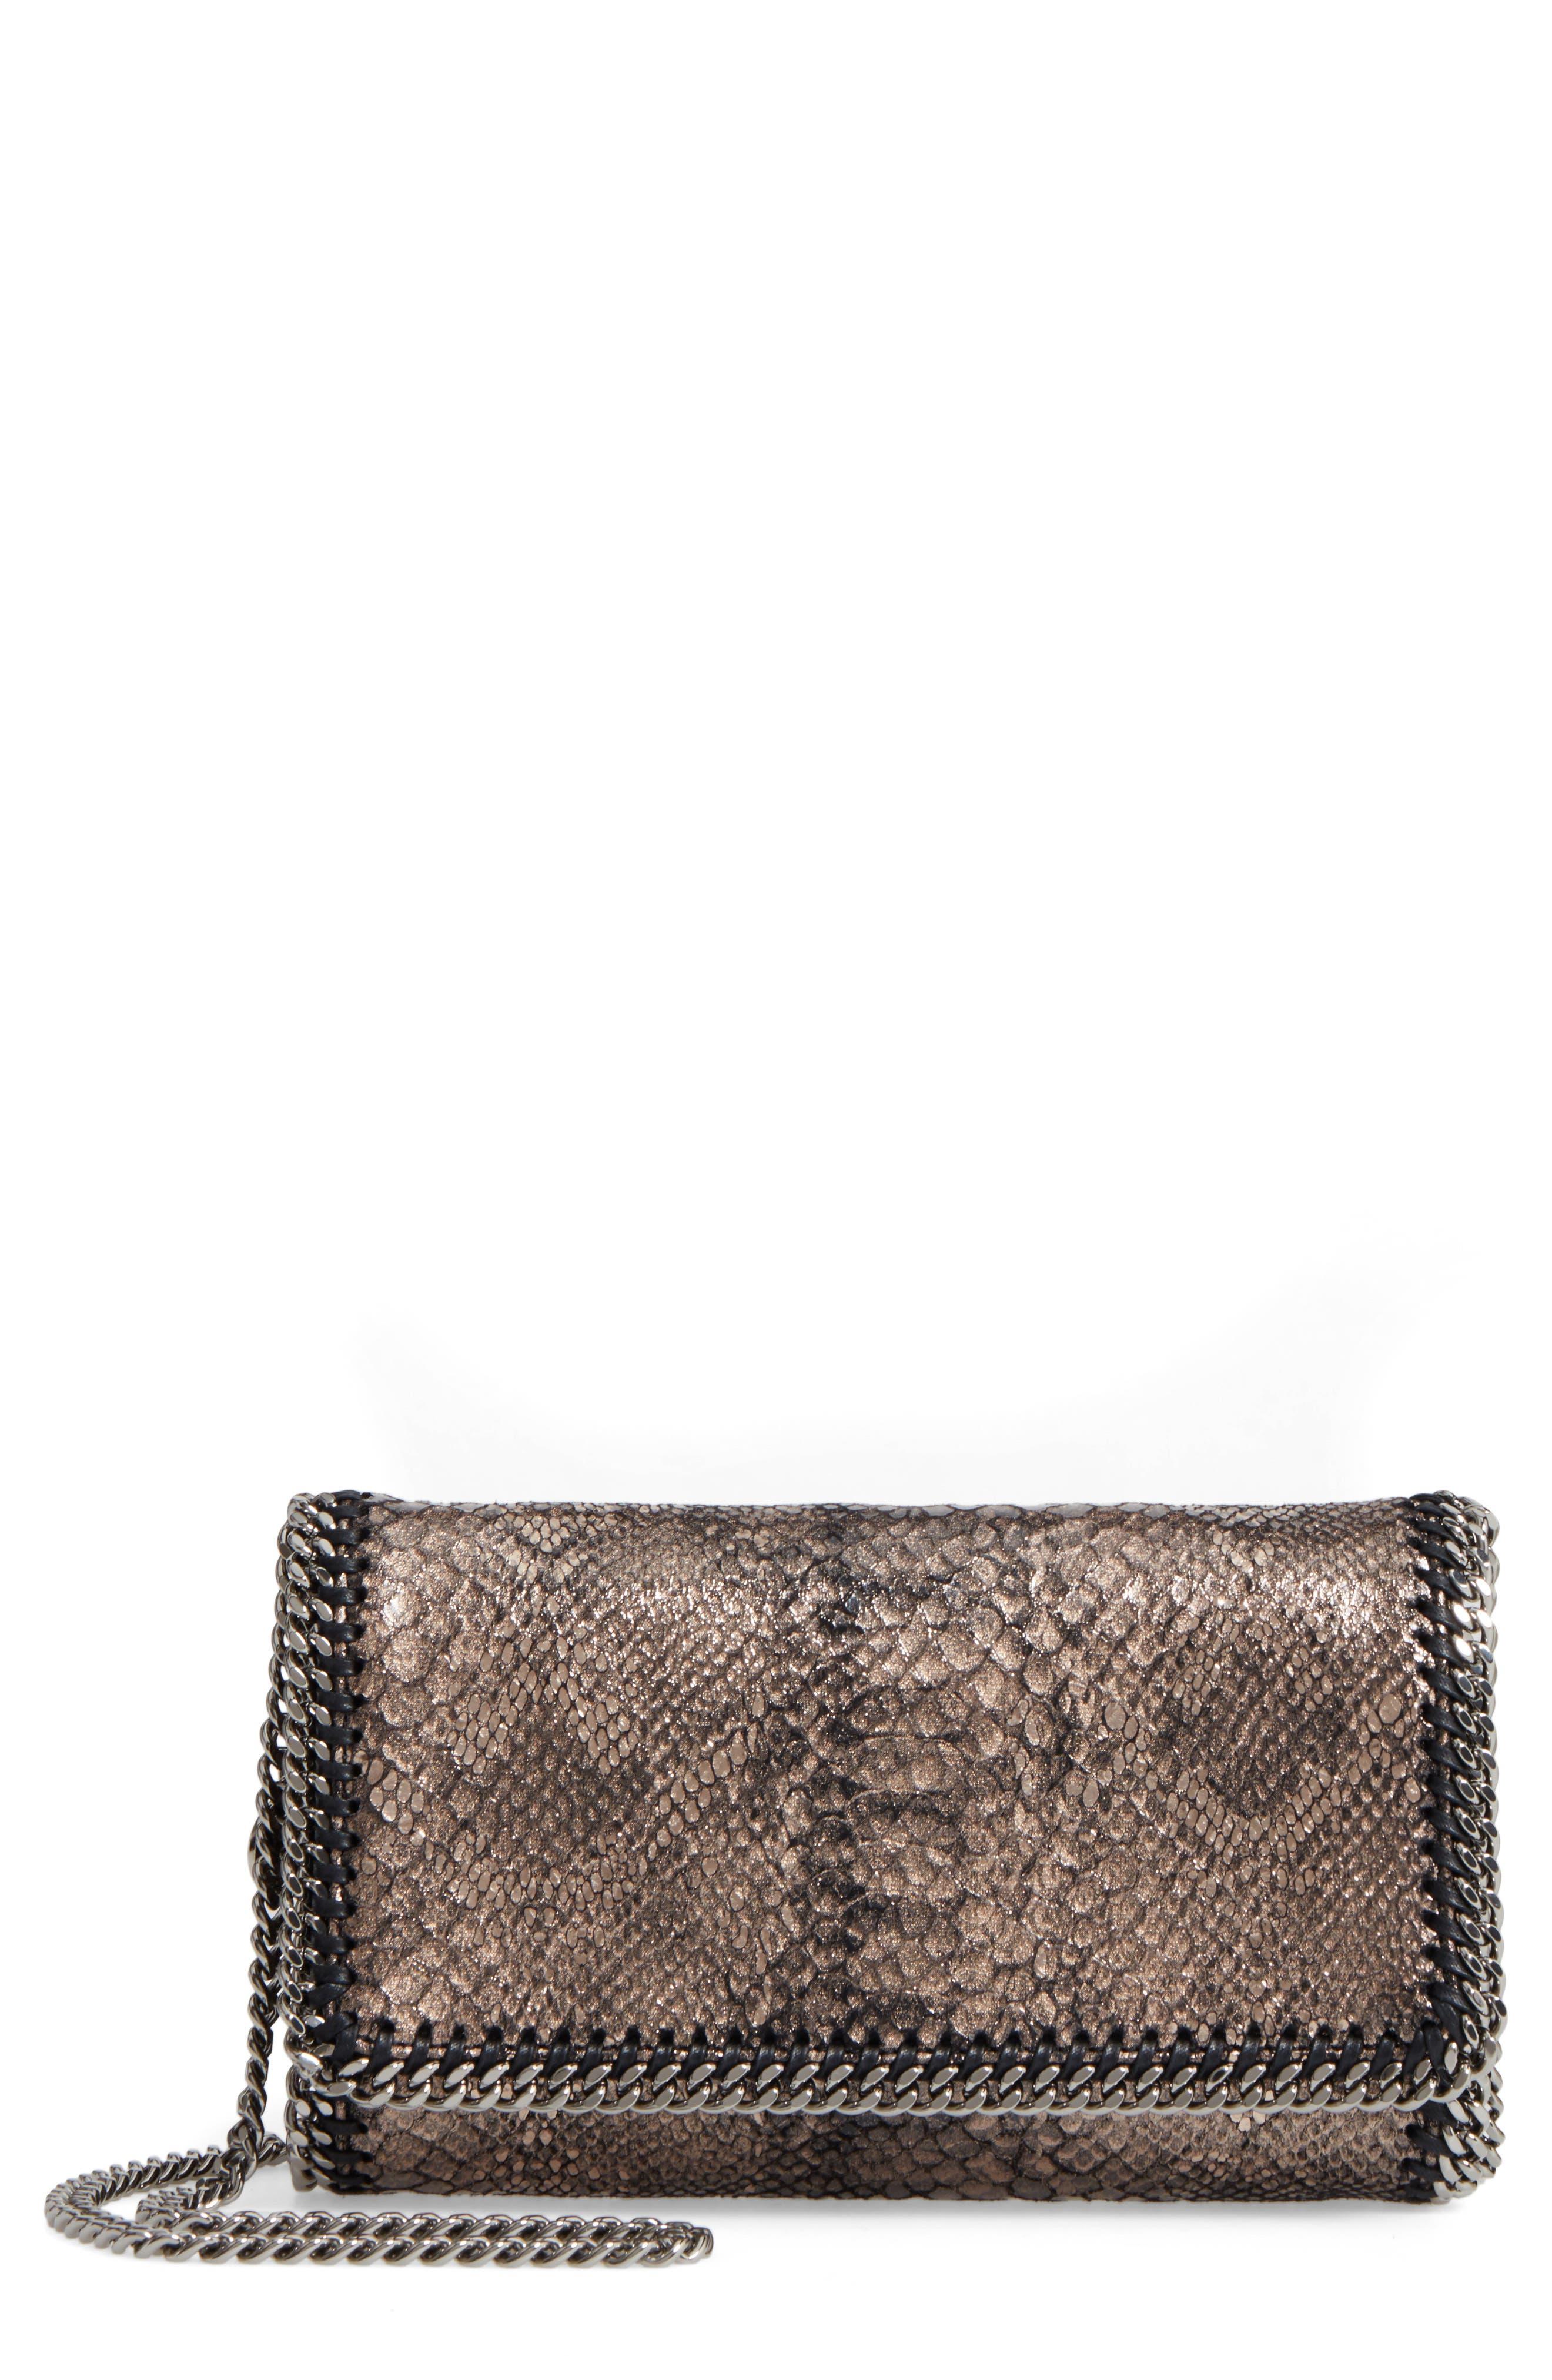 Stella McCartney Fallabella Metallic Python Print Faux Leather Crossbody Bag